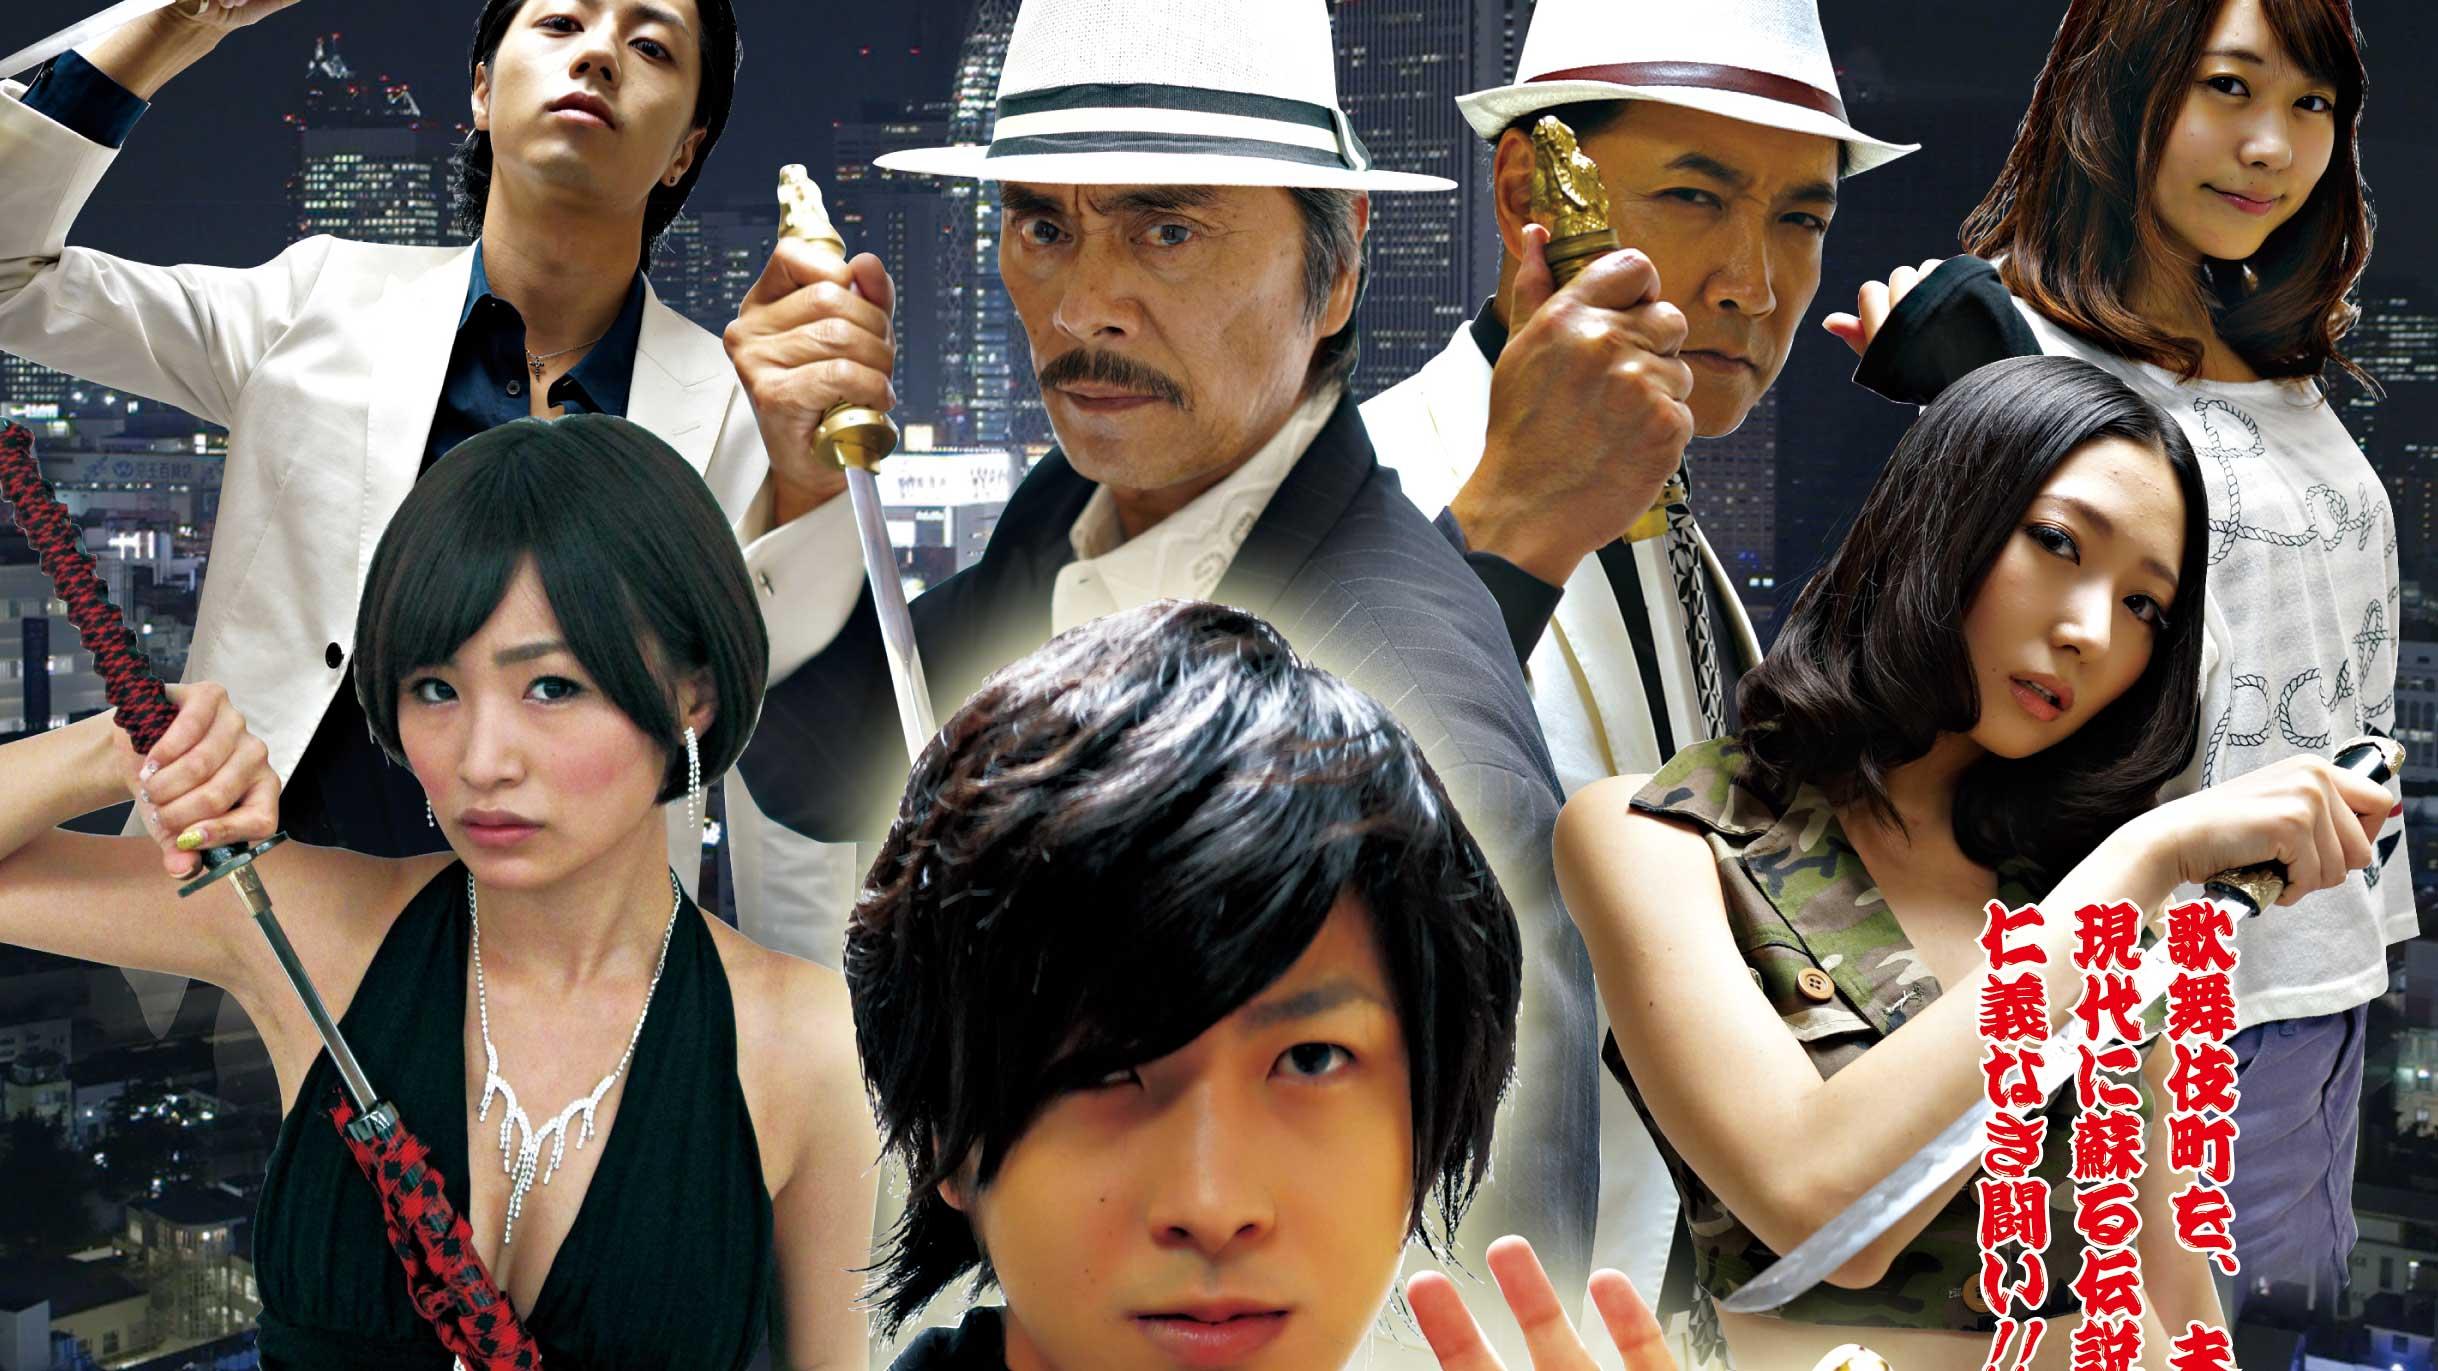 Tokusatsu Manga Artist & Actors Appear in Crowdfunded Dragon Emperor Yakuza Movie